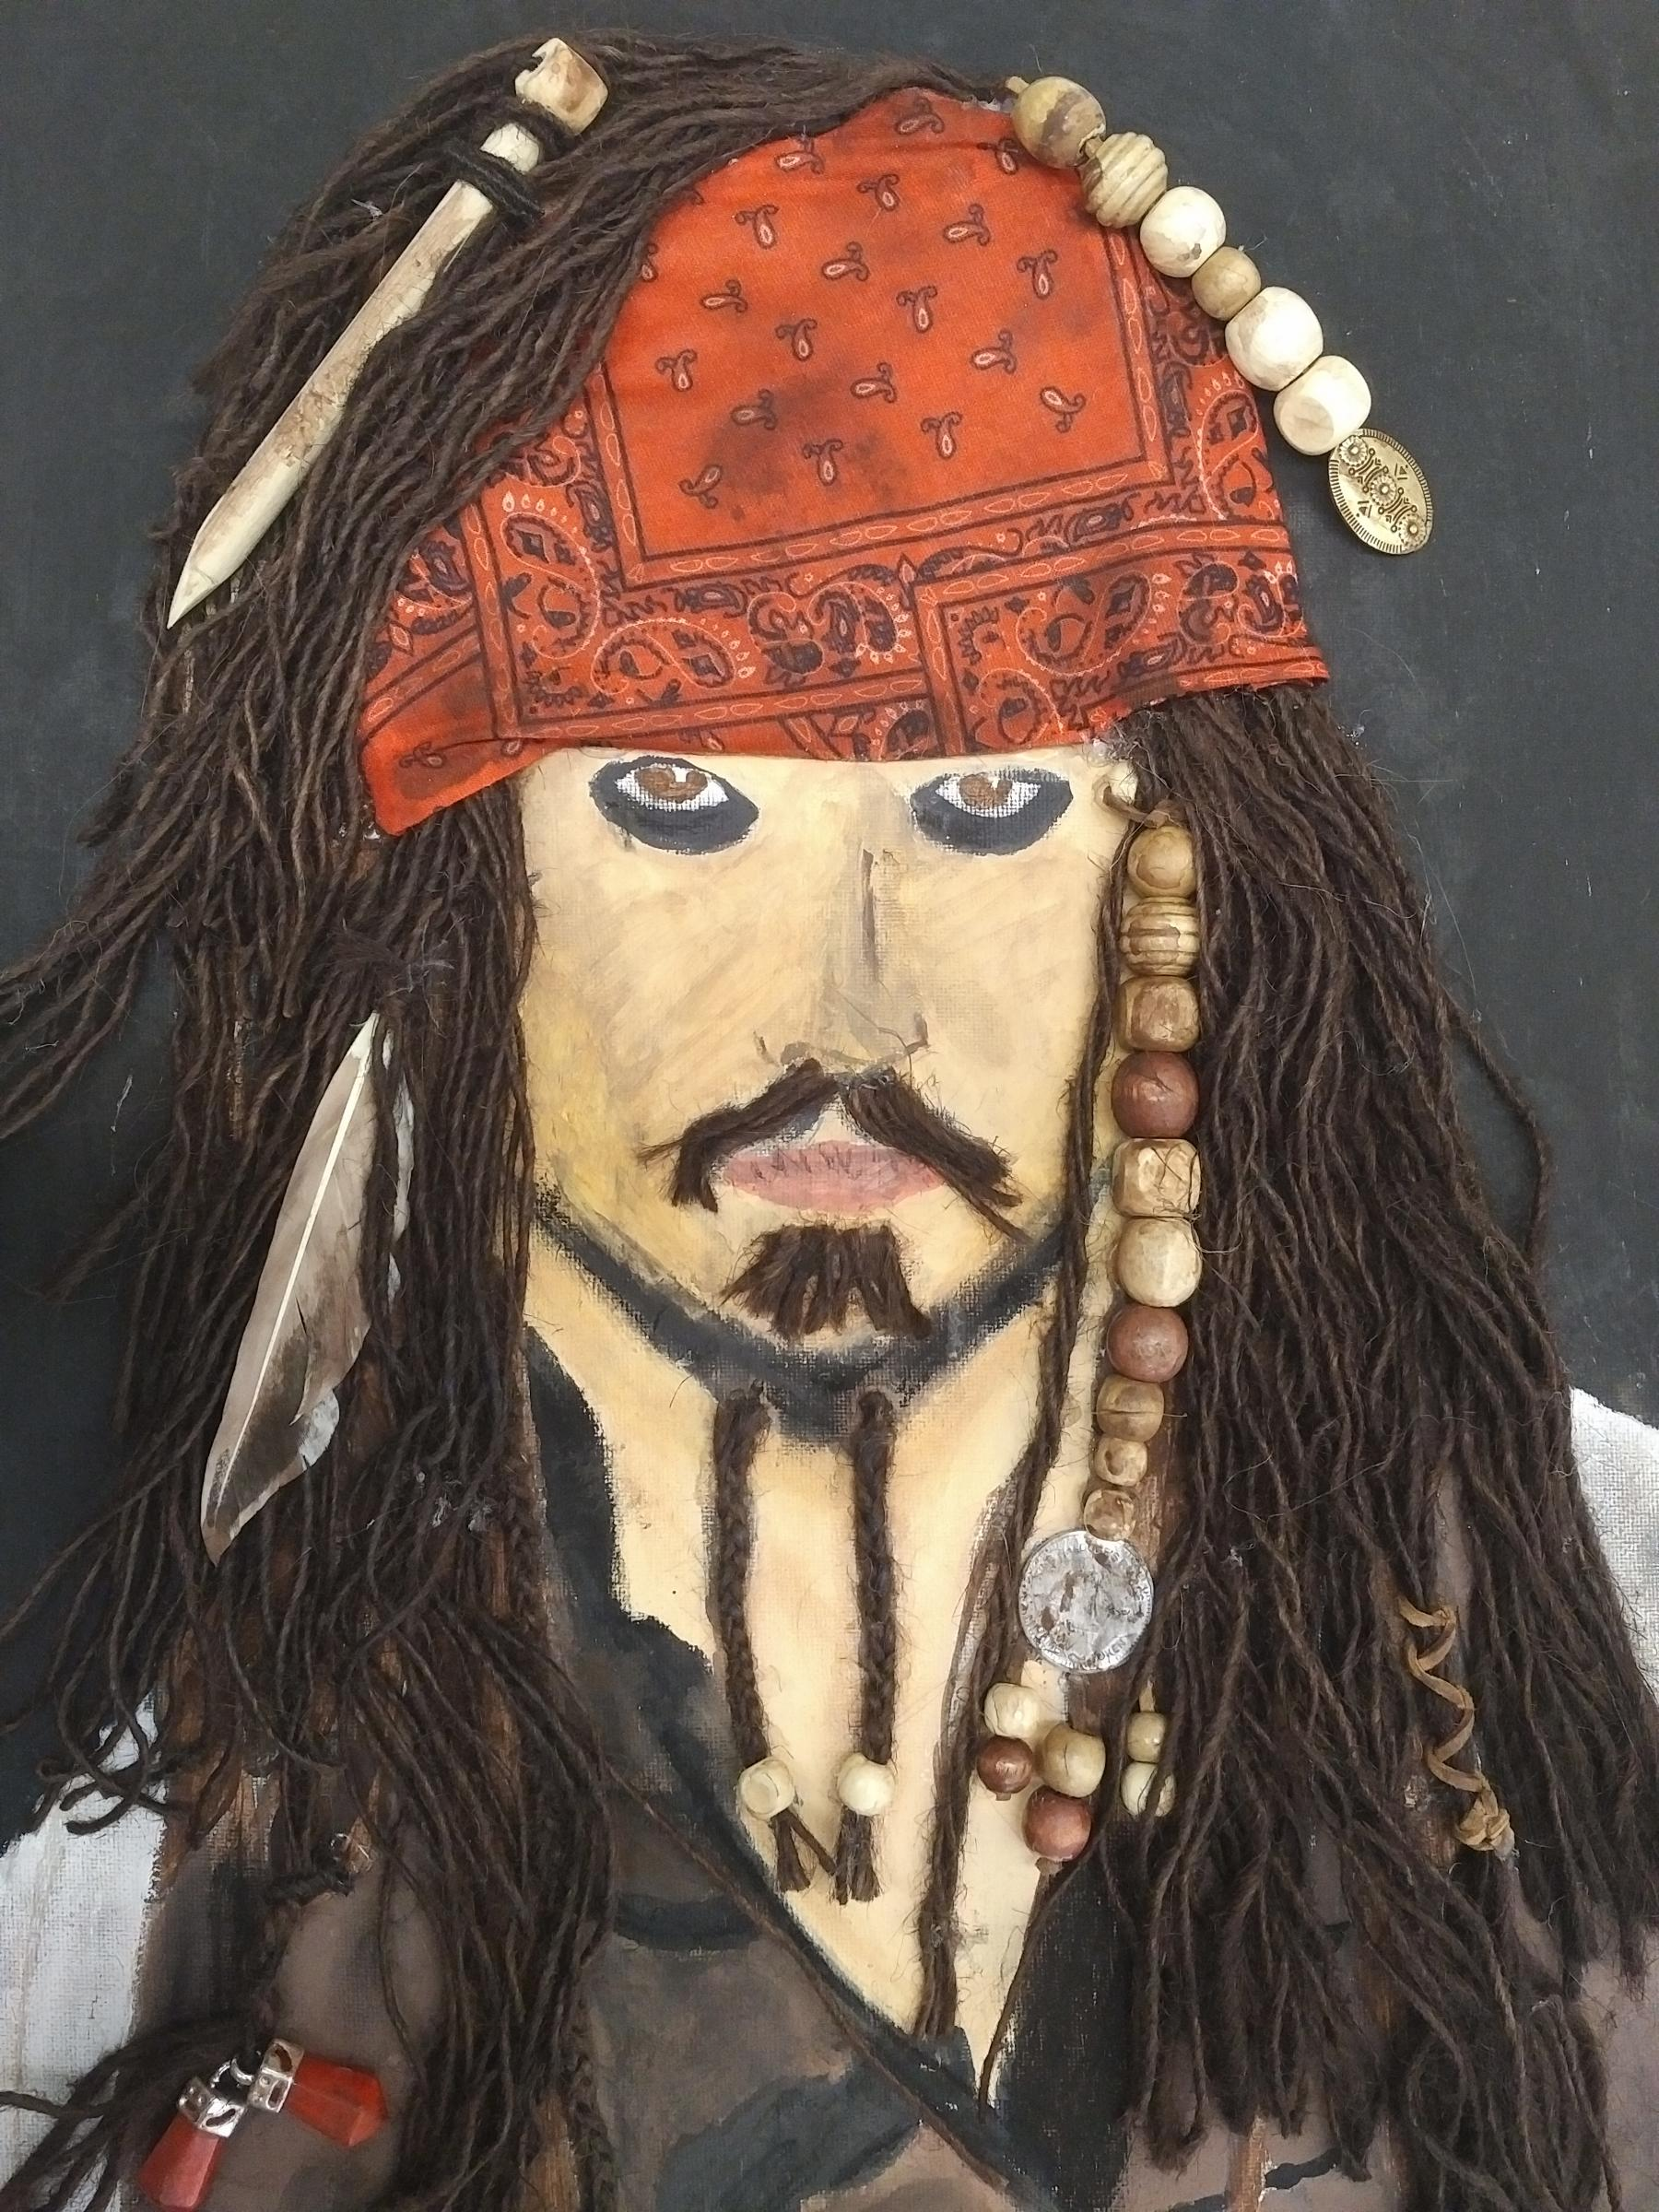 Jack Sparrow by Brianna Negron